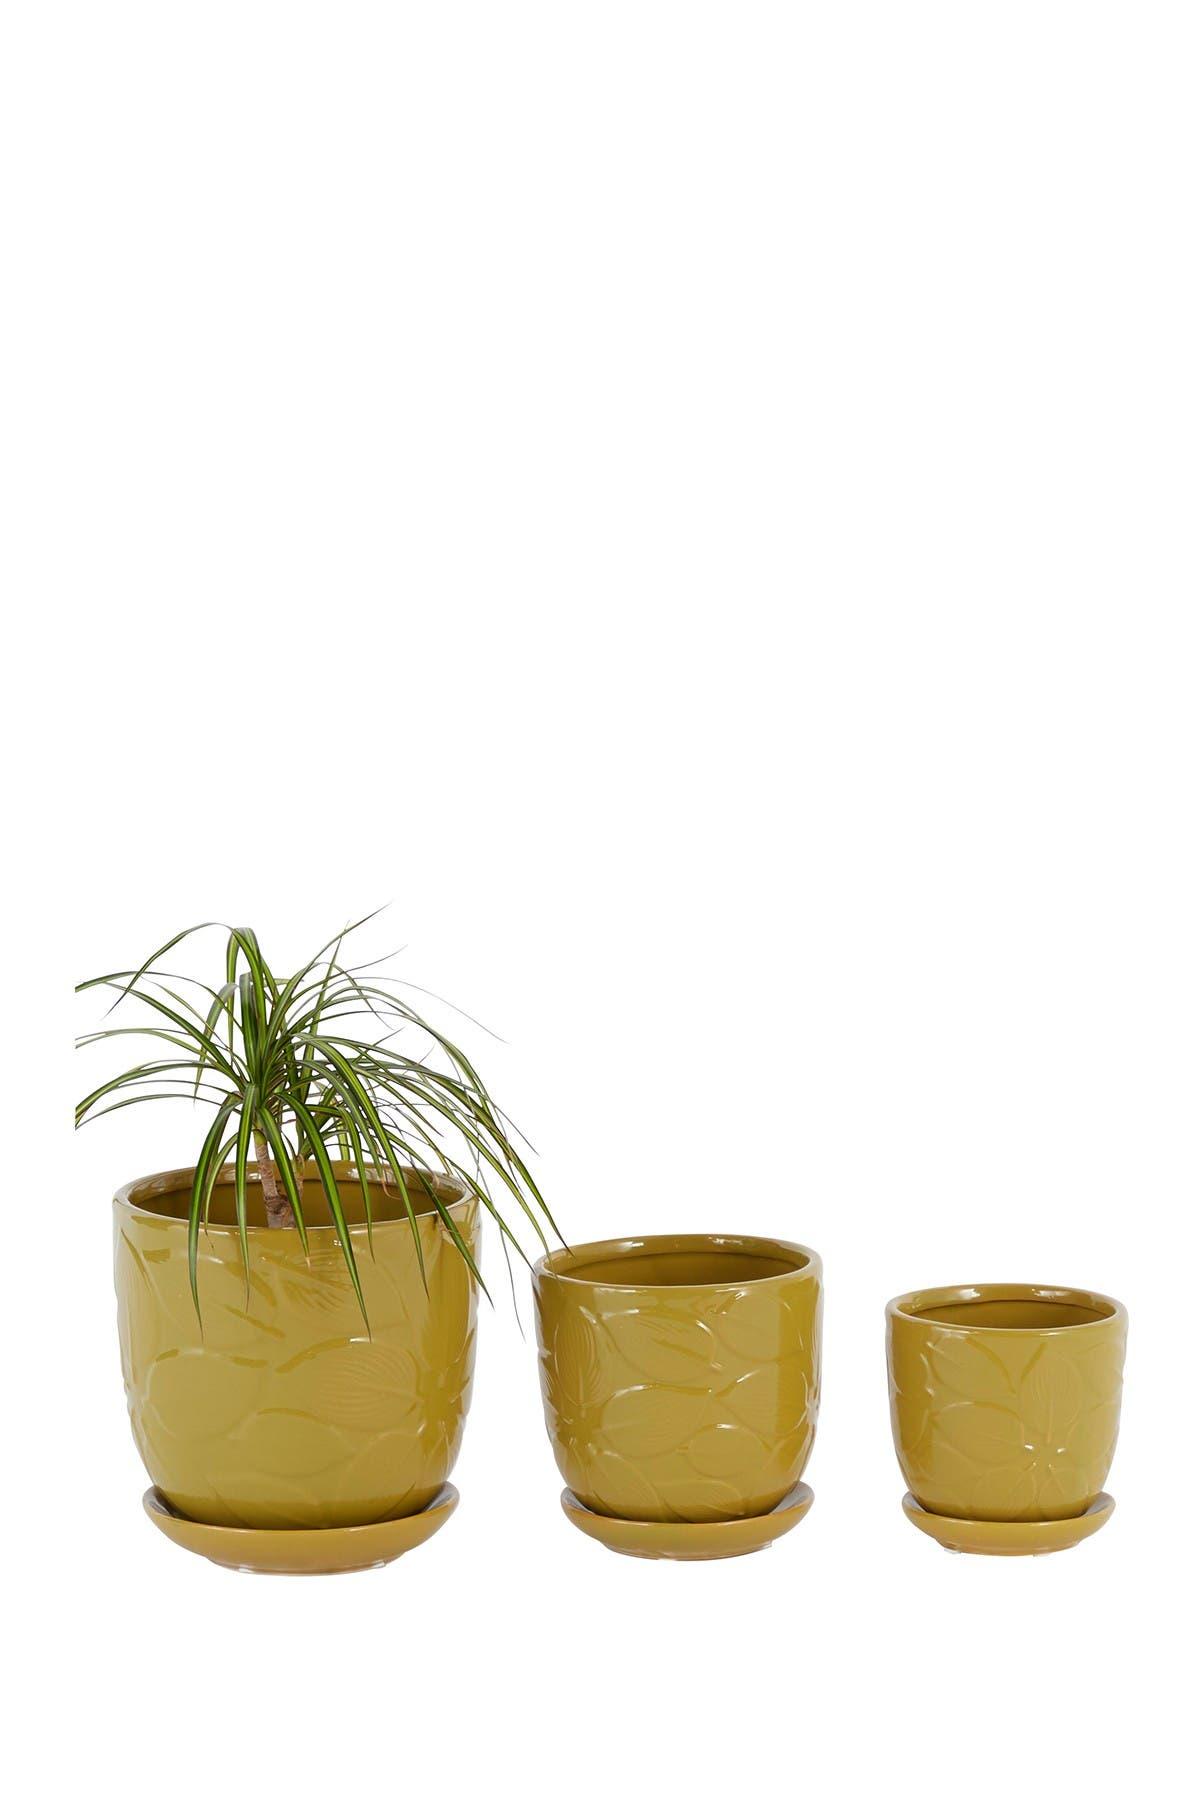 Image of VENUS WILLIAMS COLLECTION Round Gold Ceramic Planter w/ Saucer, 3-Piece Set